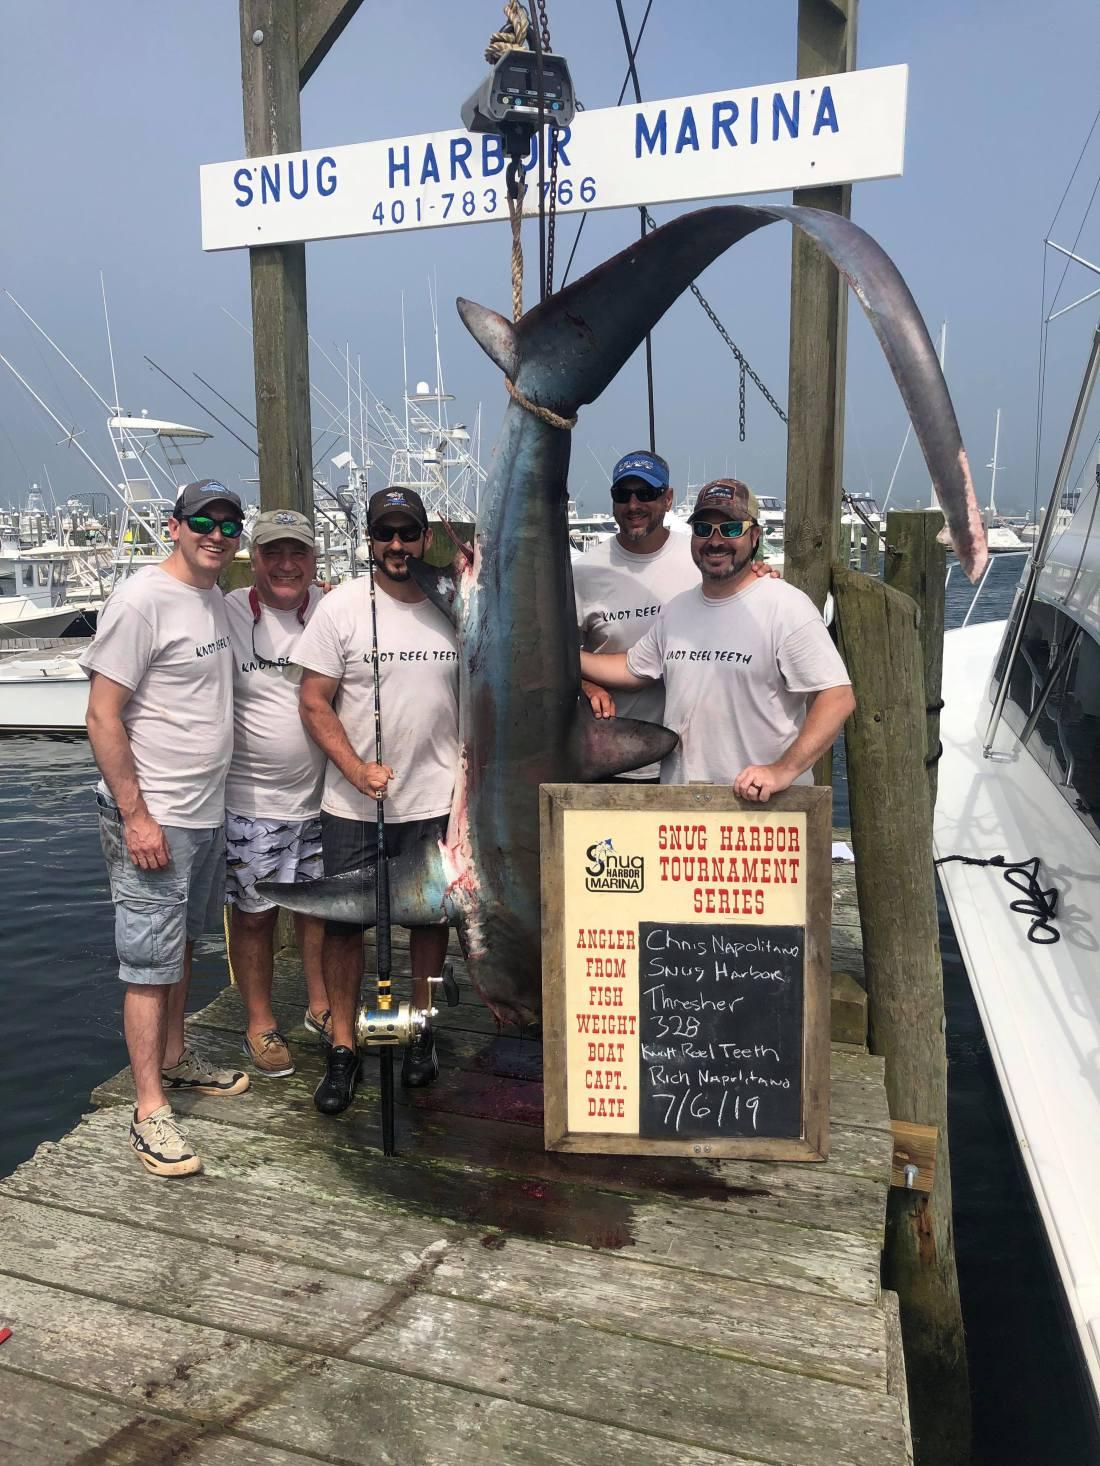 snug harbor shark tourney 2